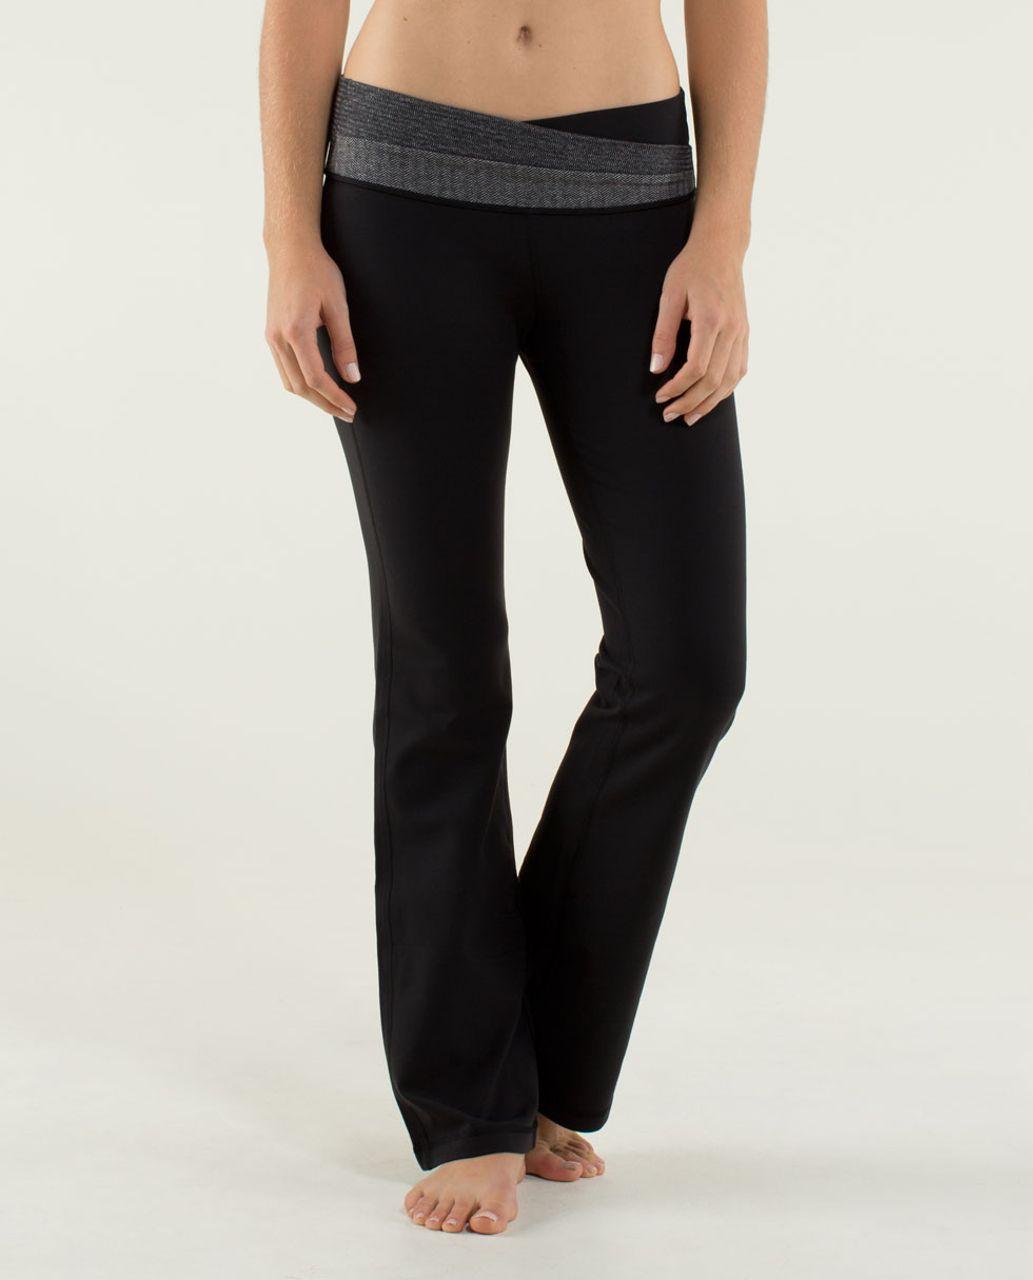 52bc86749a Lululemon Astro Pant *Brushed (Regular) - Black / Black / Deep Coal /  Heathered Slate / Black - lulu fanatics